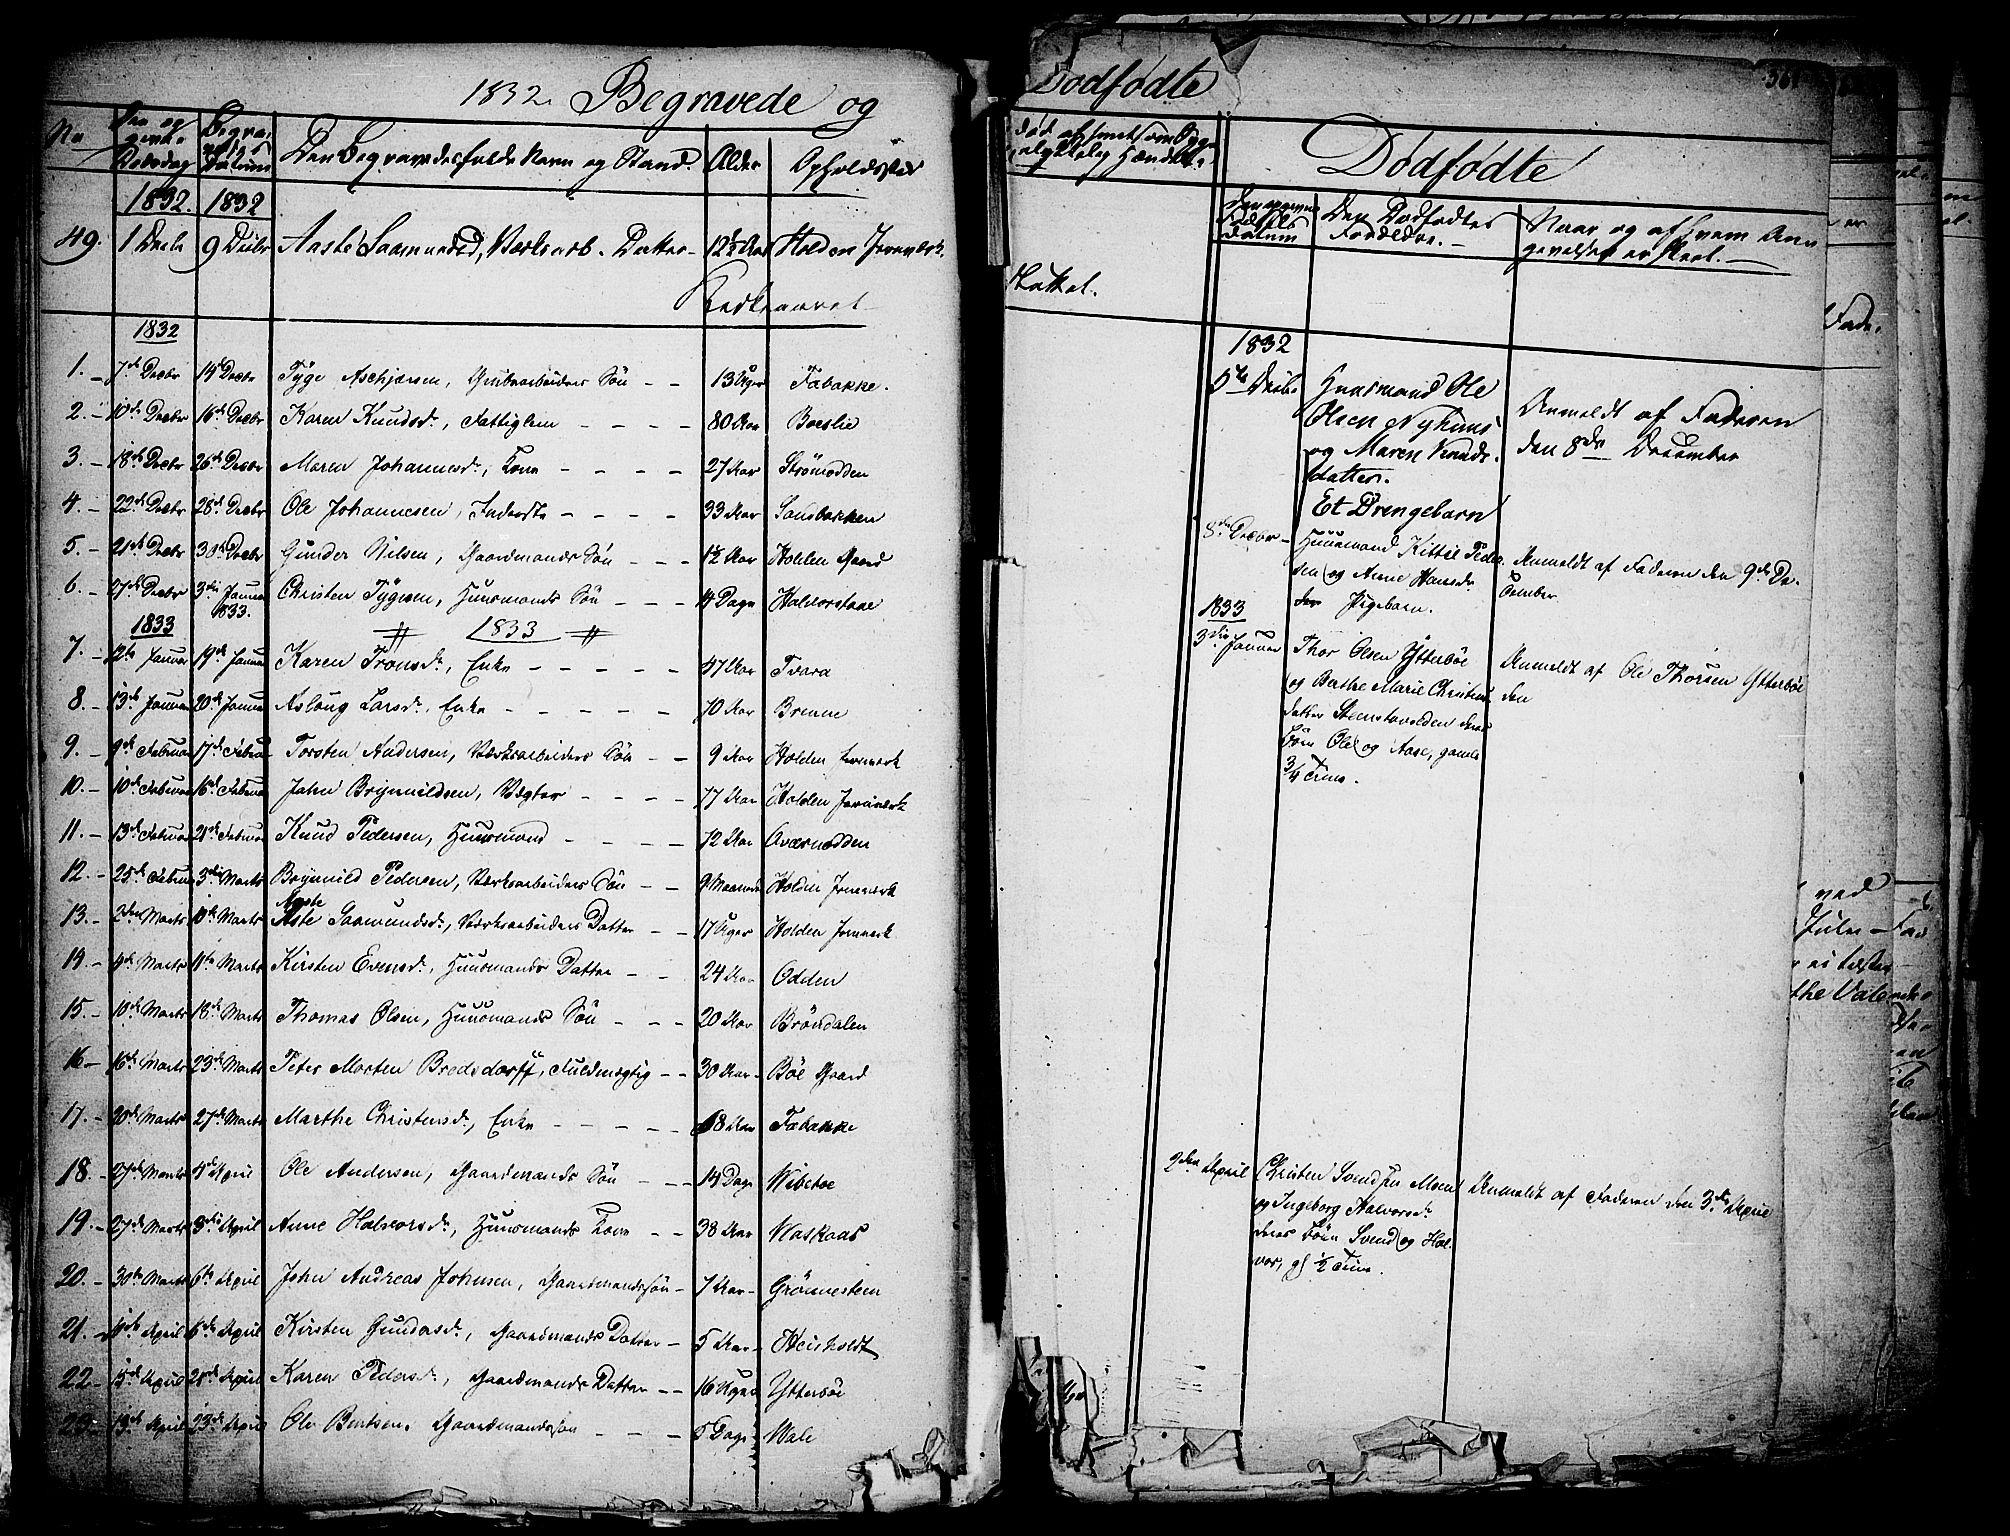 SAKO, Holla kirkebøker, F/Fa/L0004: Ministerialbok nr. 4, 1830-1848, s. 361